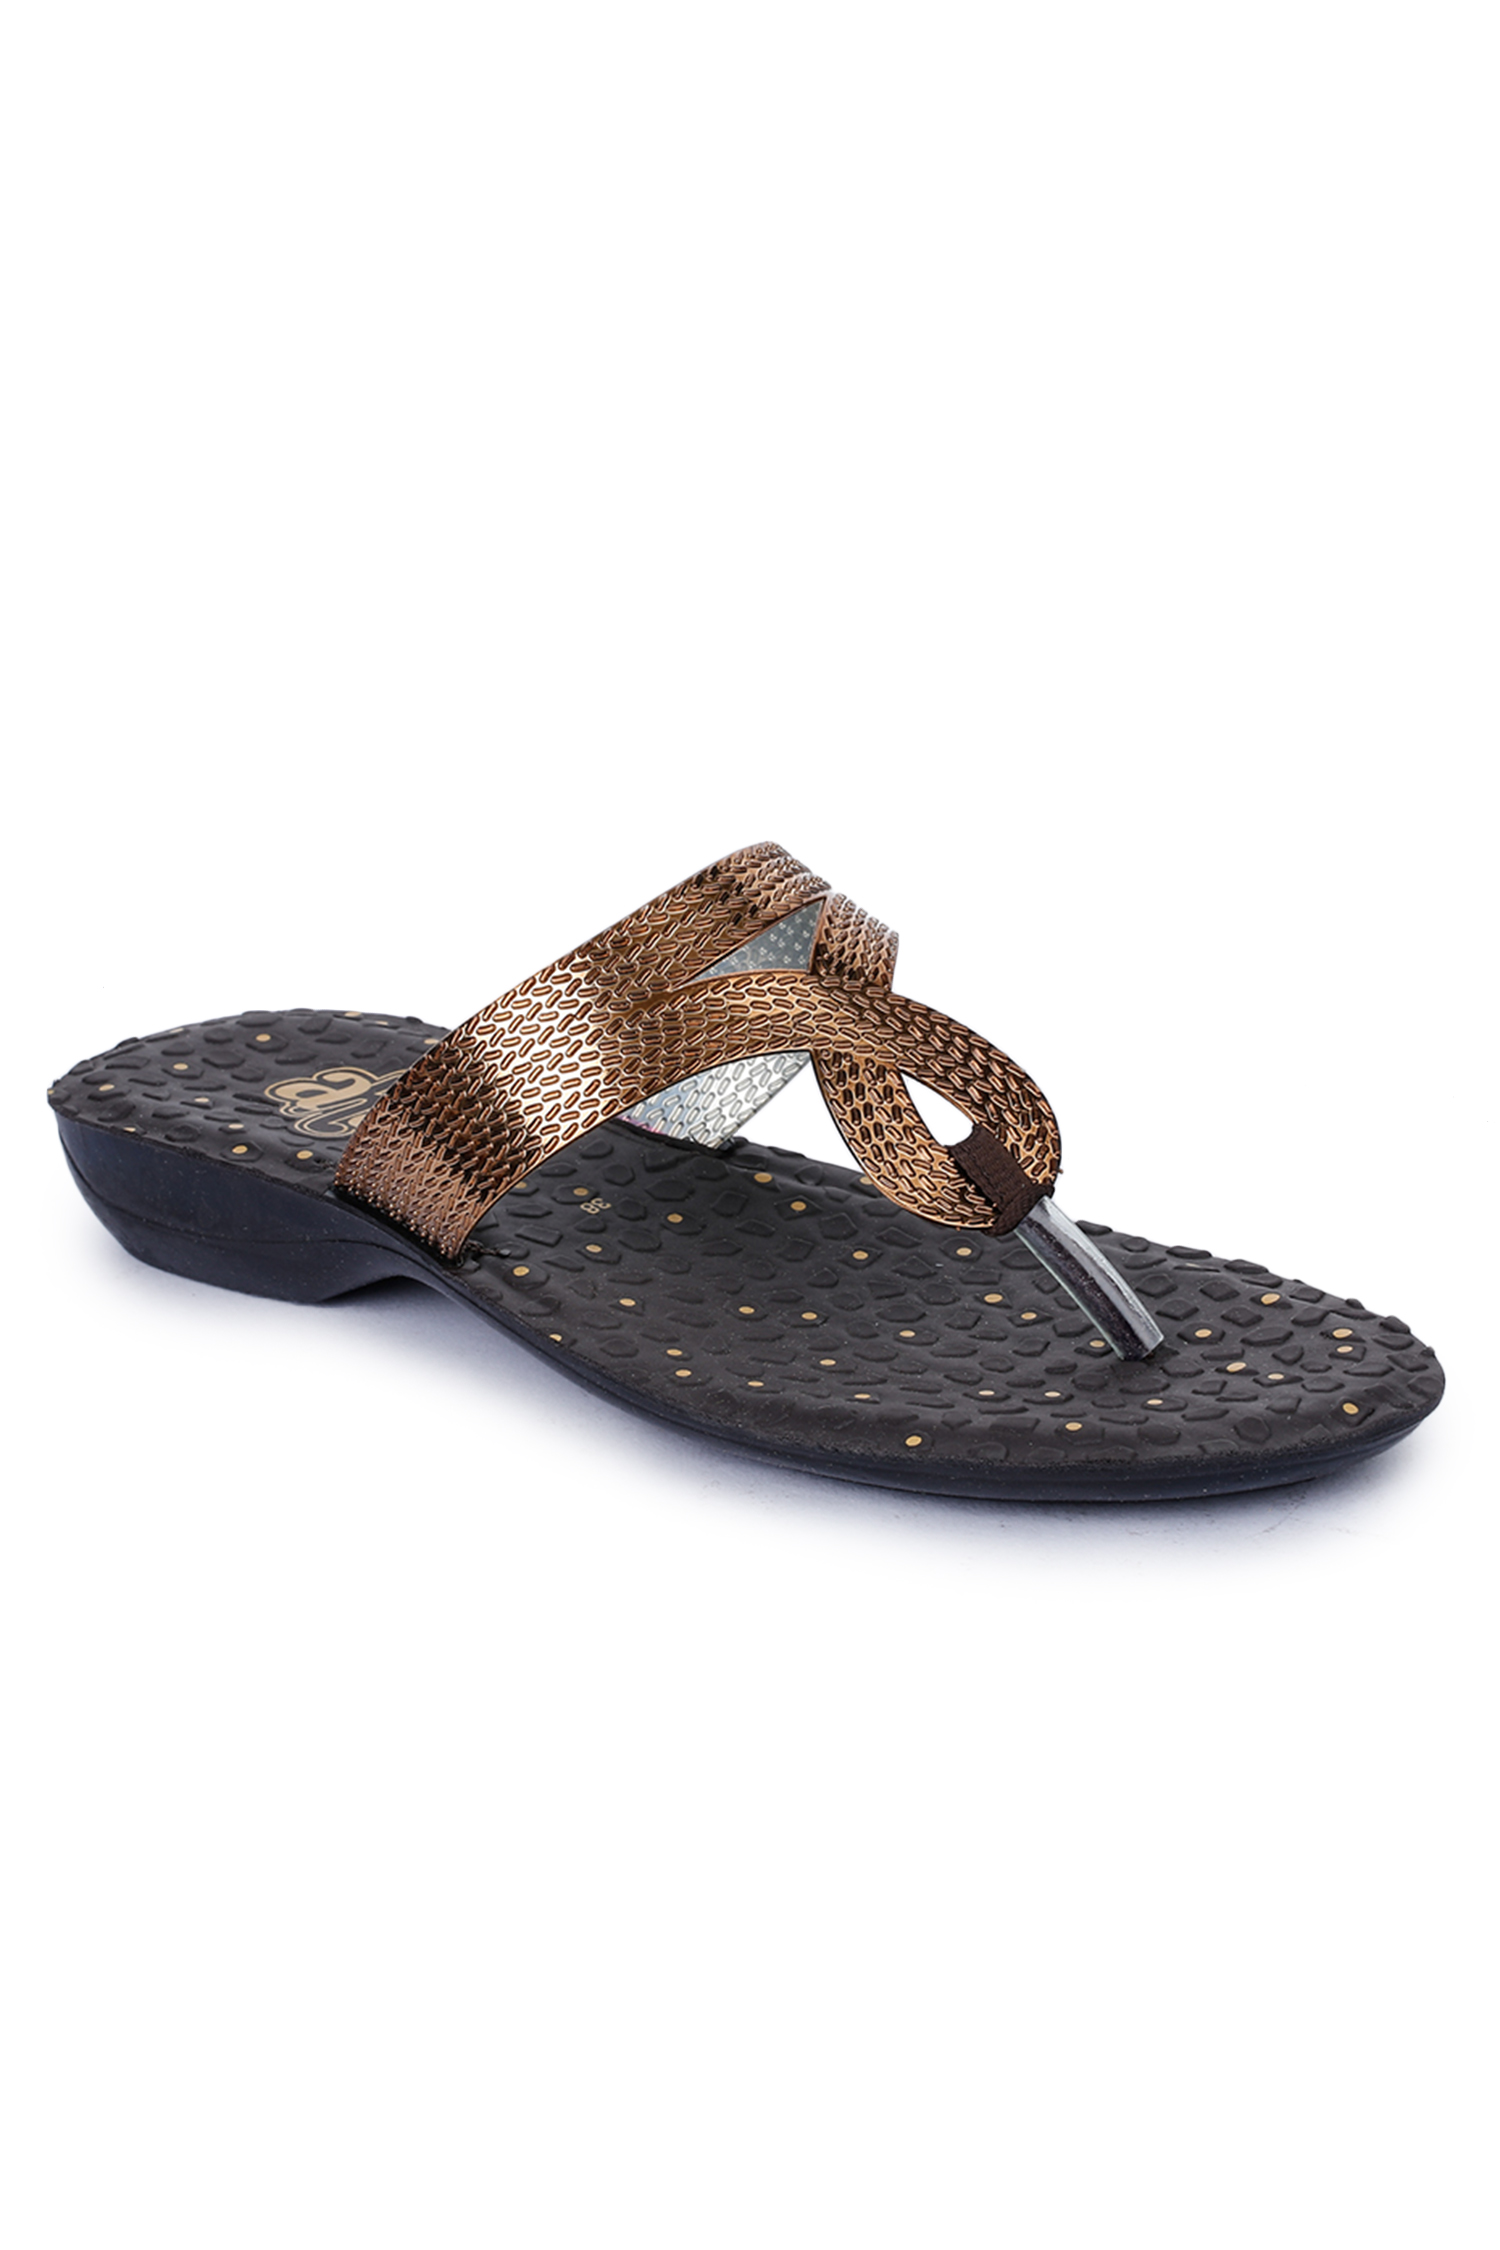 Liberty | Liberty A-HA Sandals ETHNIC-05_COPPER For - Women